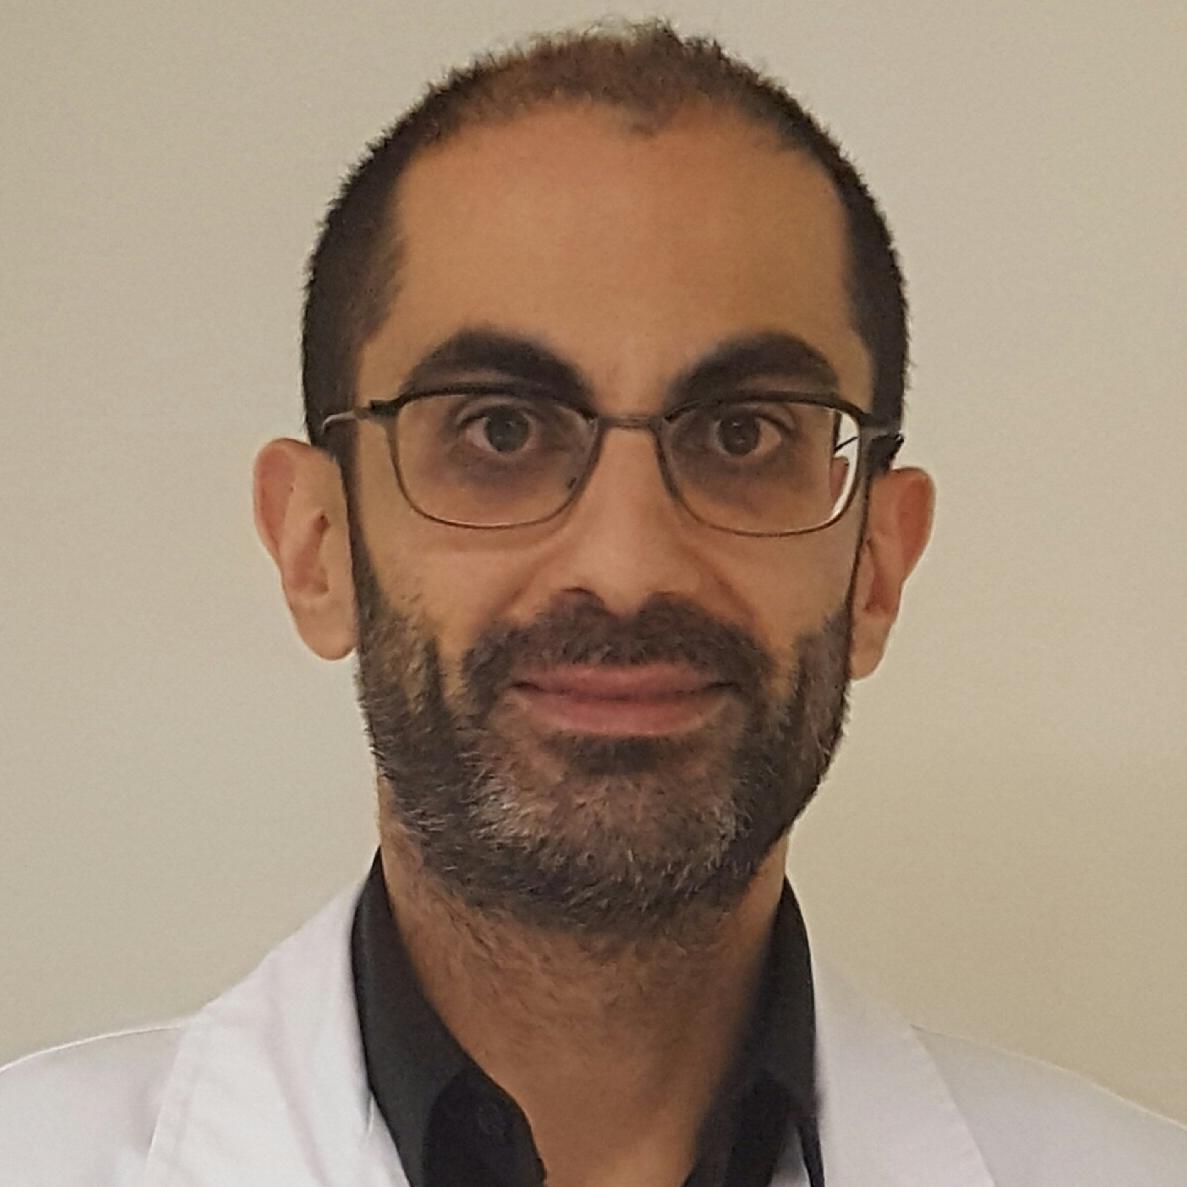 Dr. José Luís Dapena Díaz